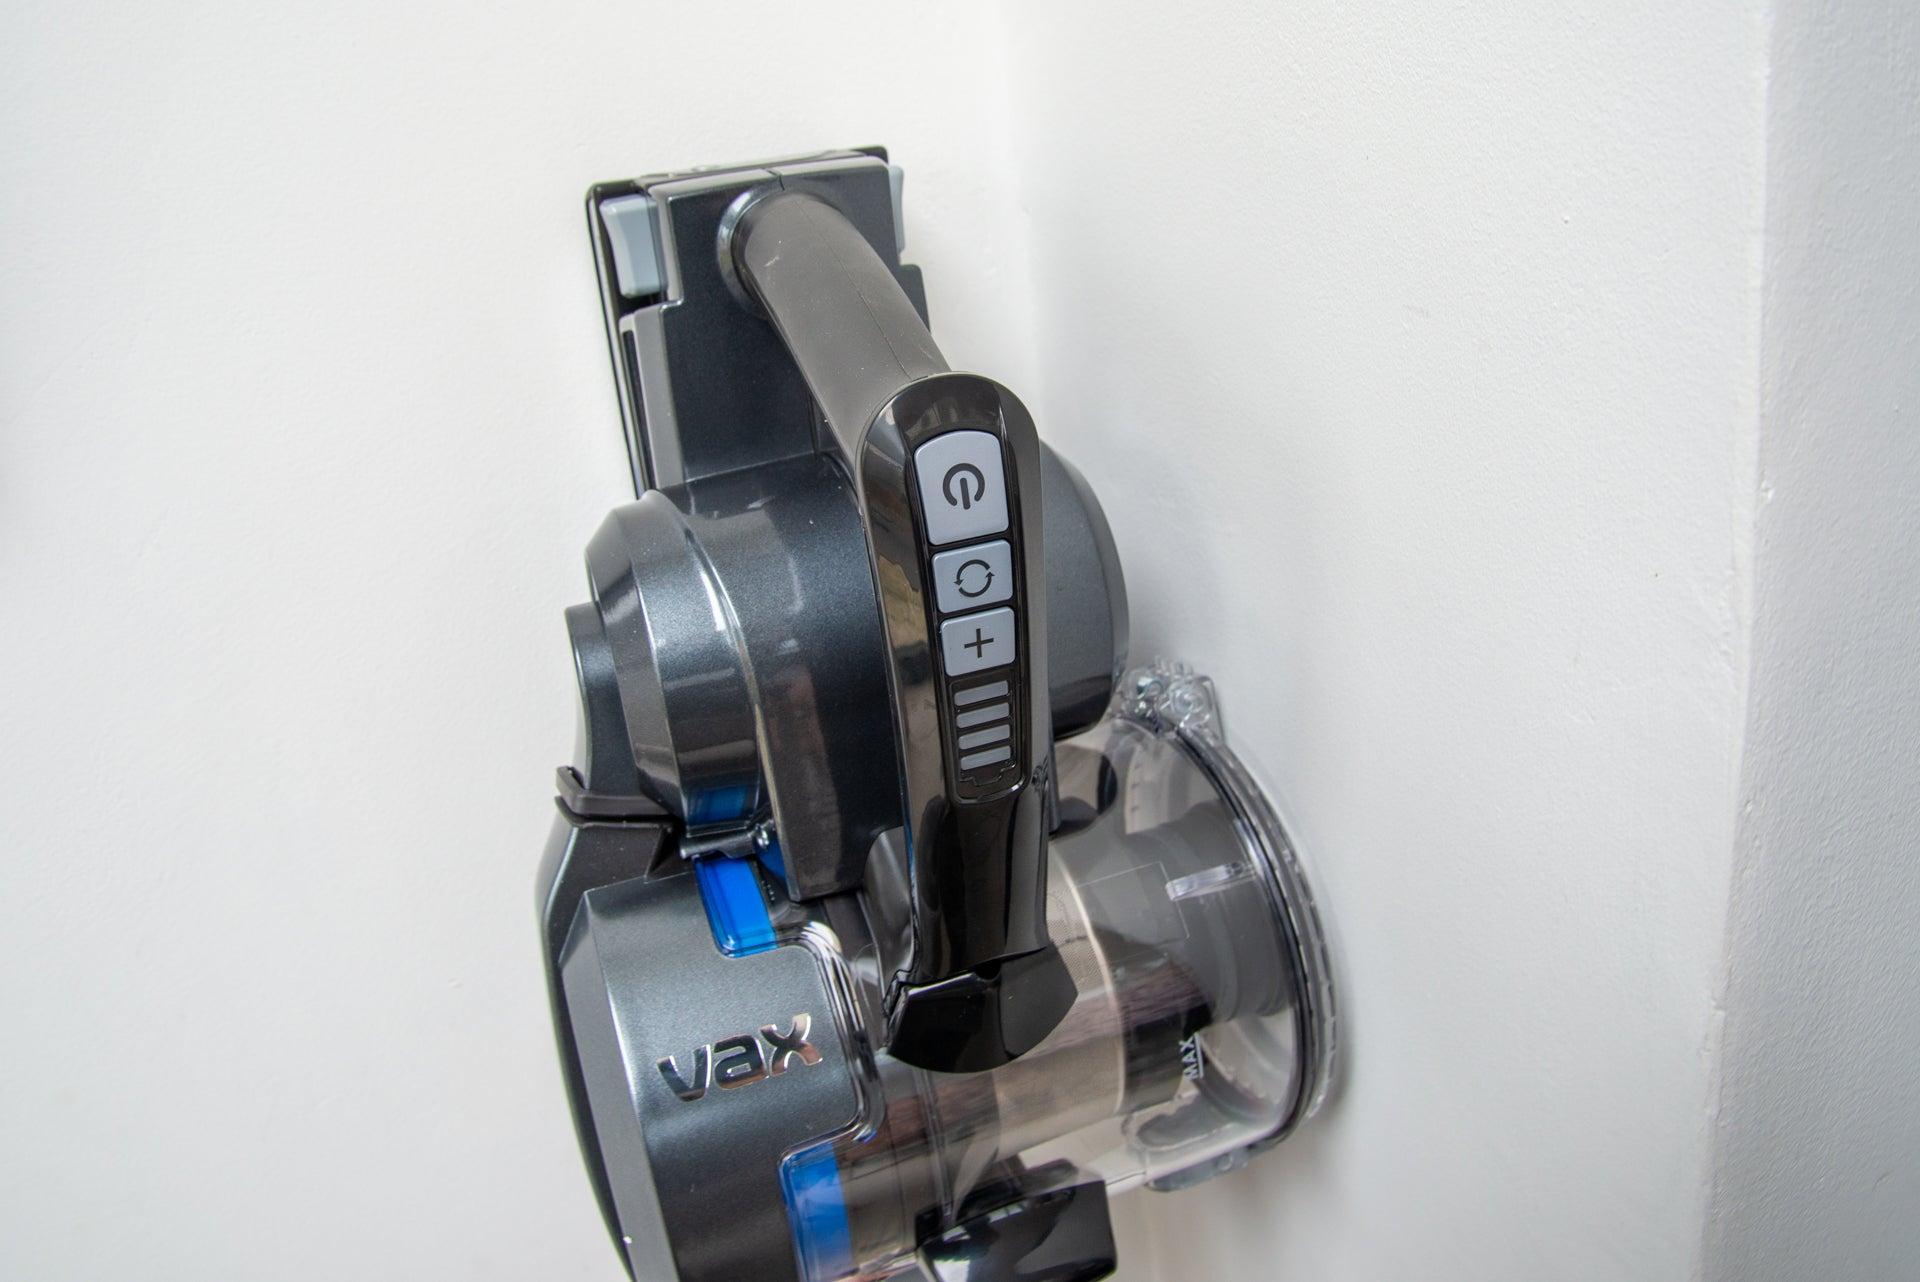 Vax ONEPWR Blade 4 controls